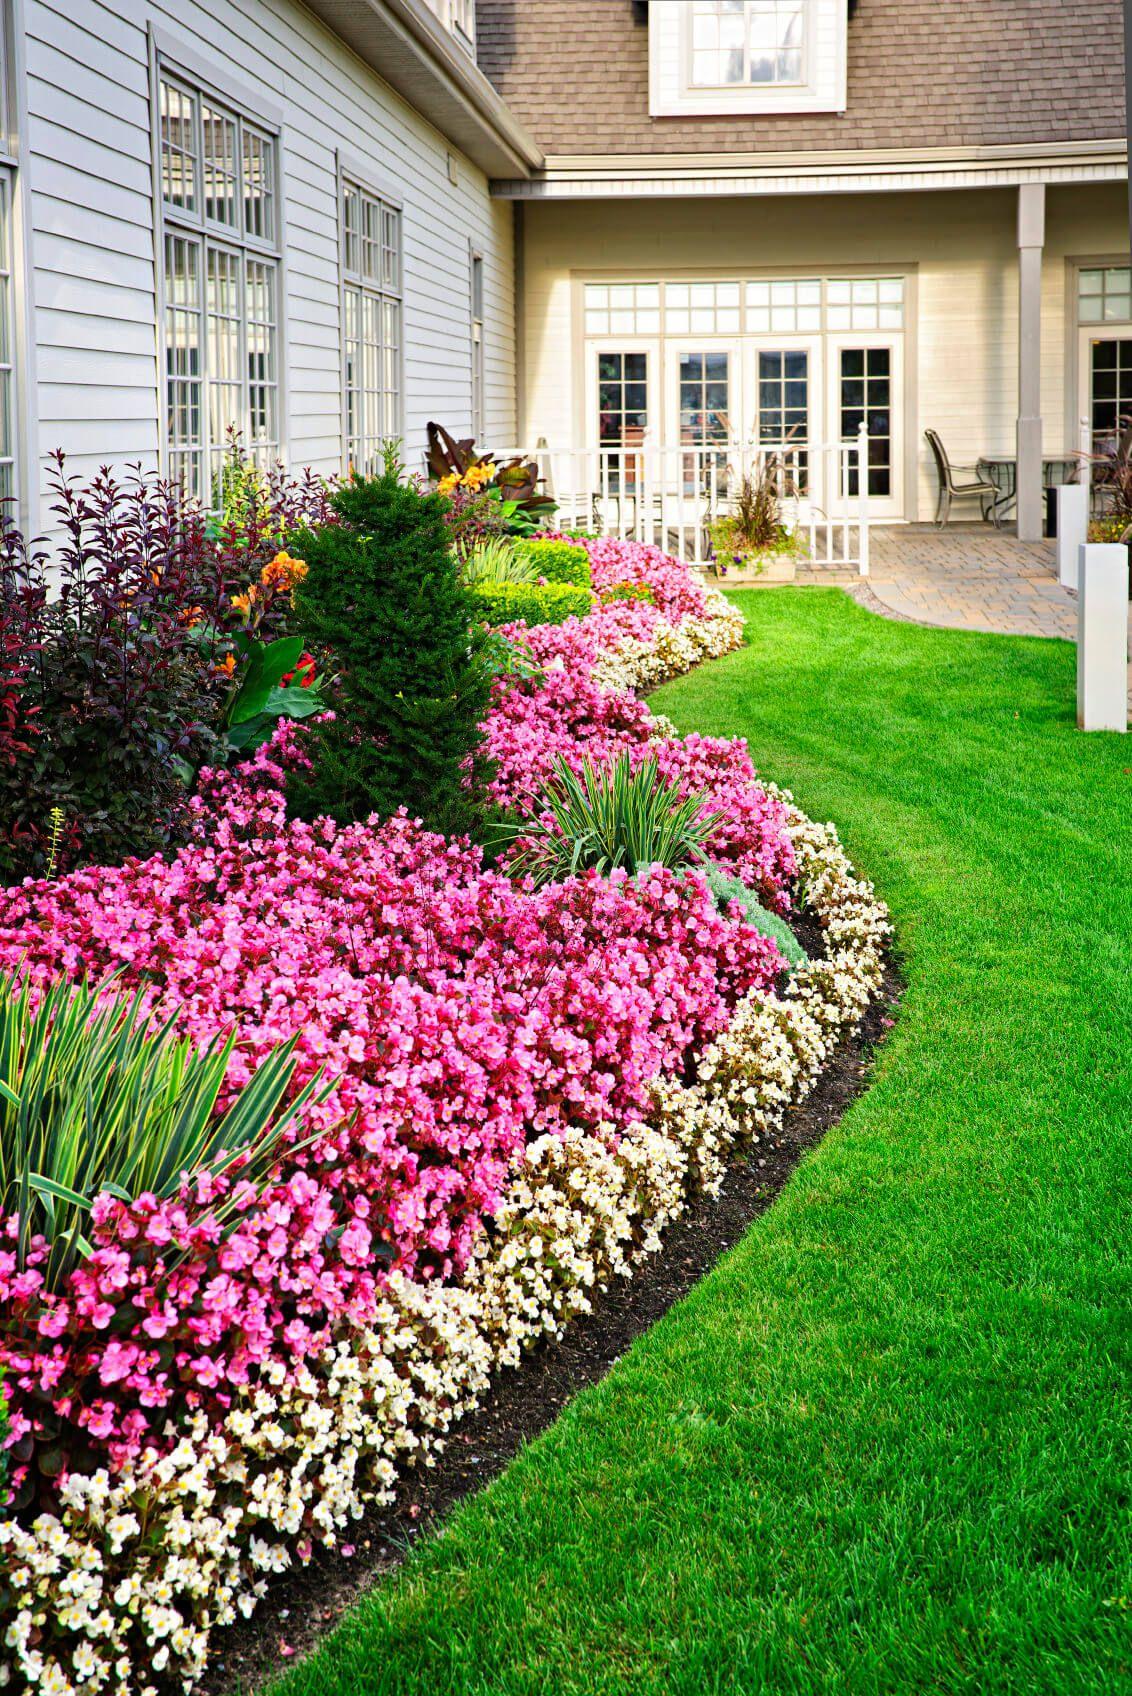 101 Front Yard Landscaping Ideas Photos Garden Landscape